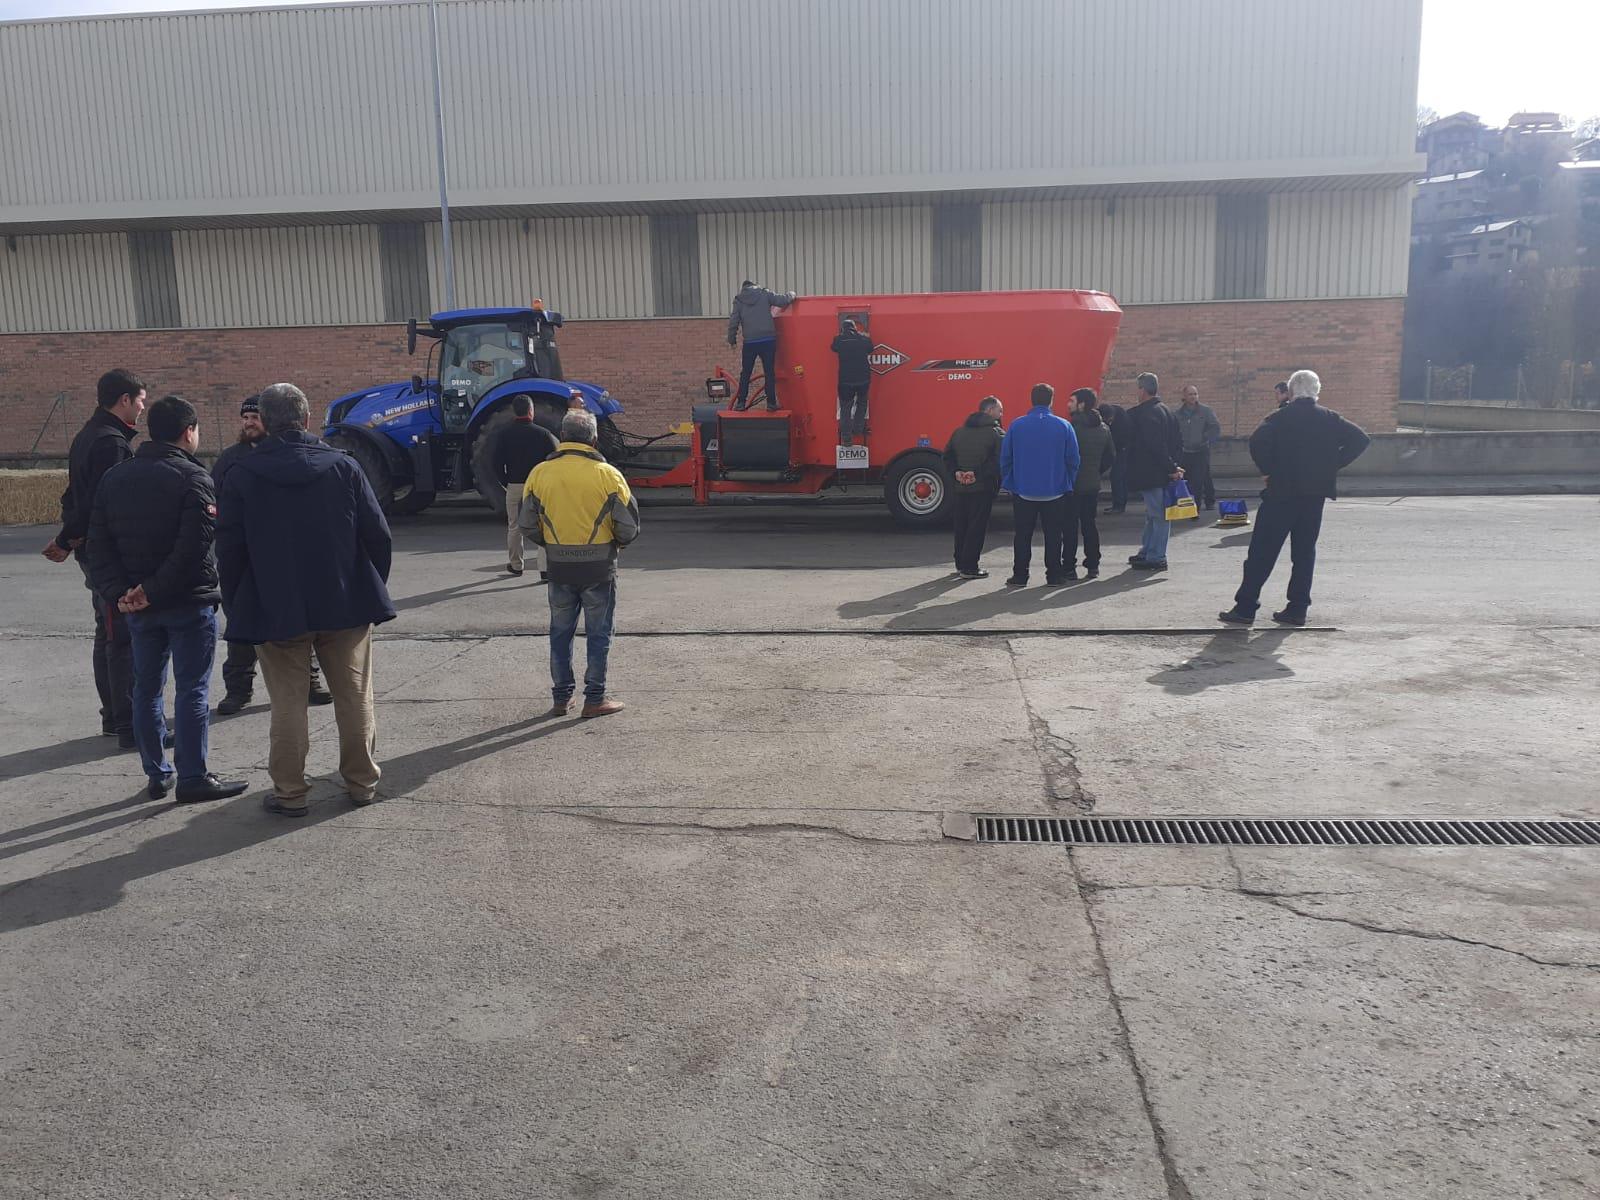 Jornada Agricola NewHolland- Kuhn Motor Tarrega